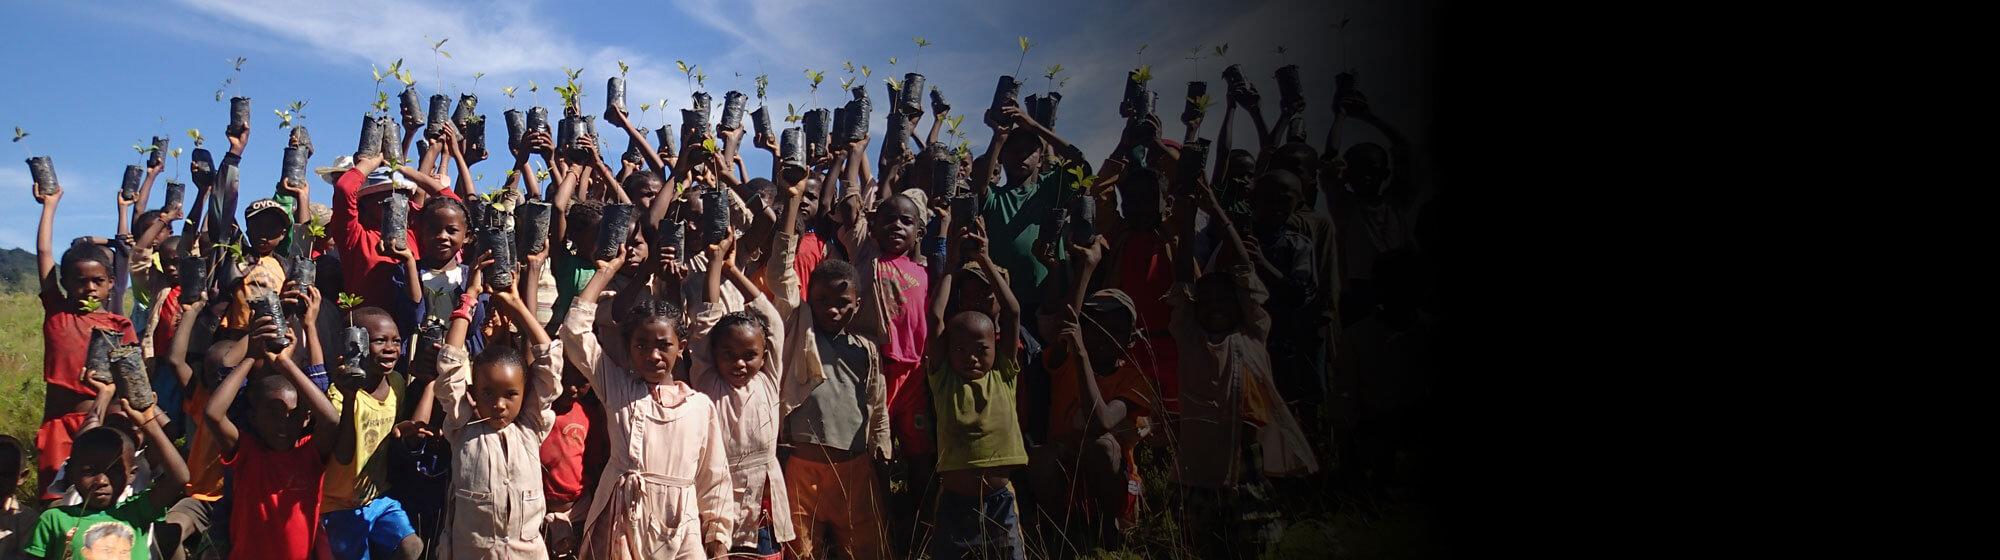 A school planting trees in Madagascar